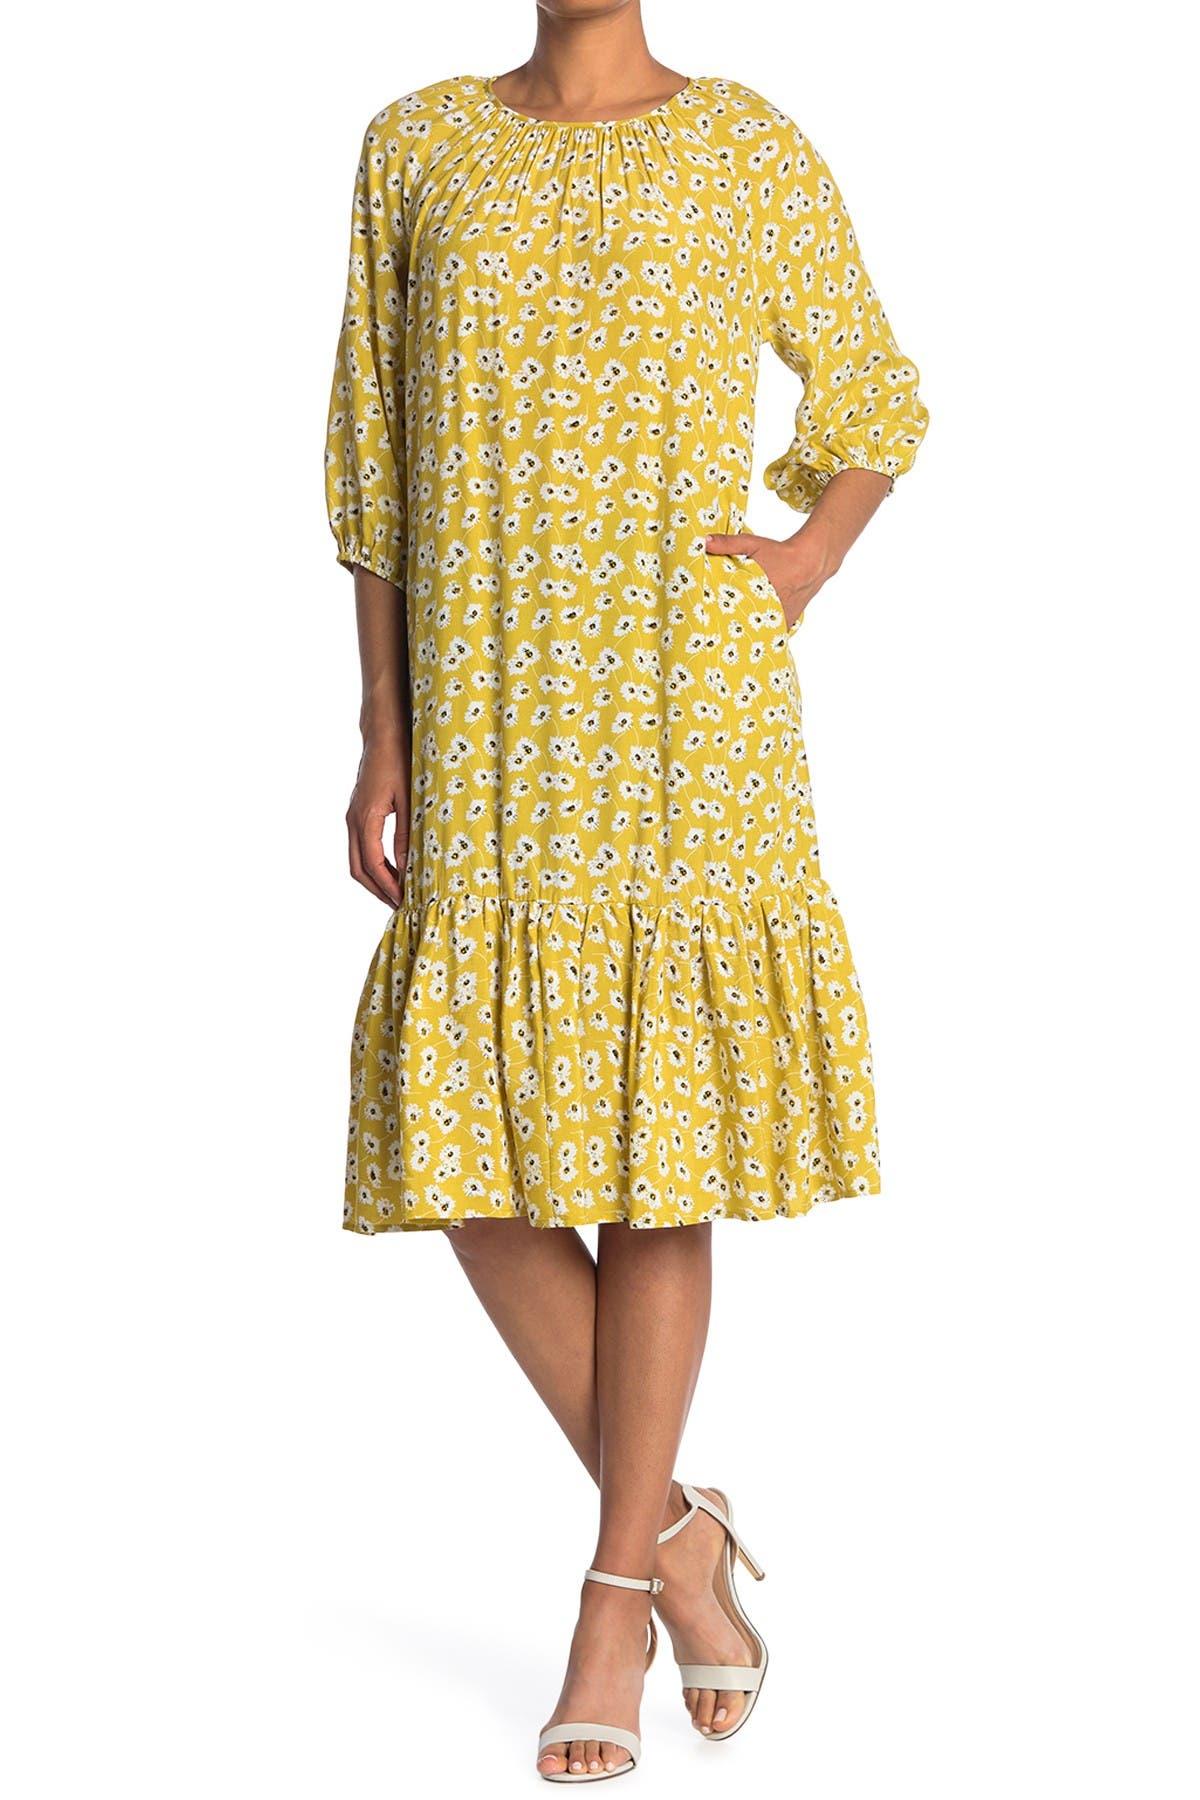 Image of MELLODAY Elbow Sleeve Ruffle Hem Midi Dress